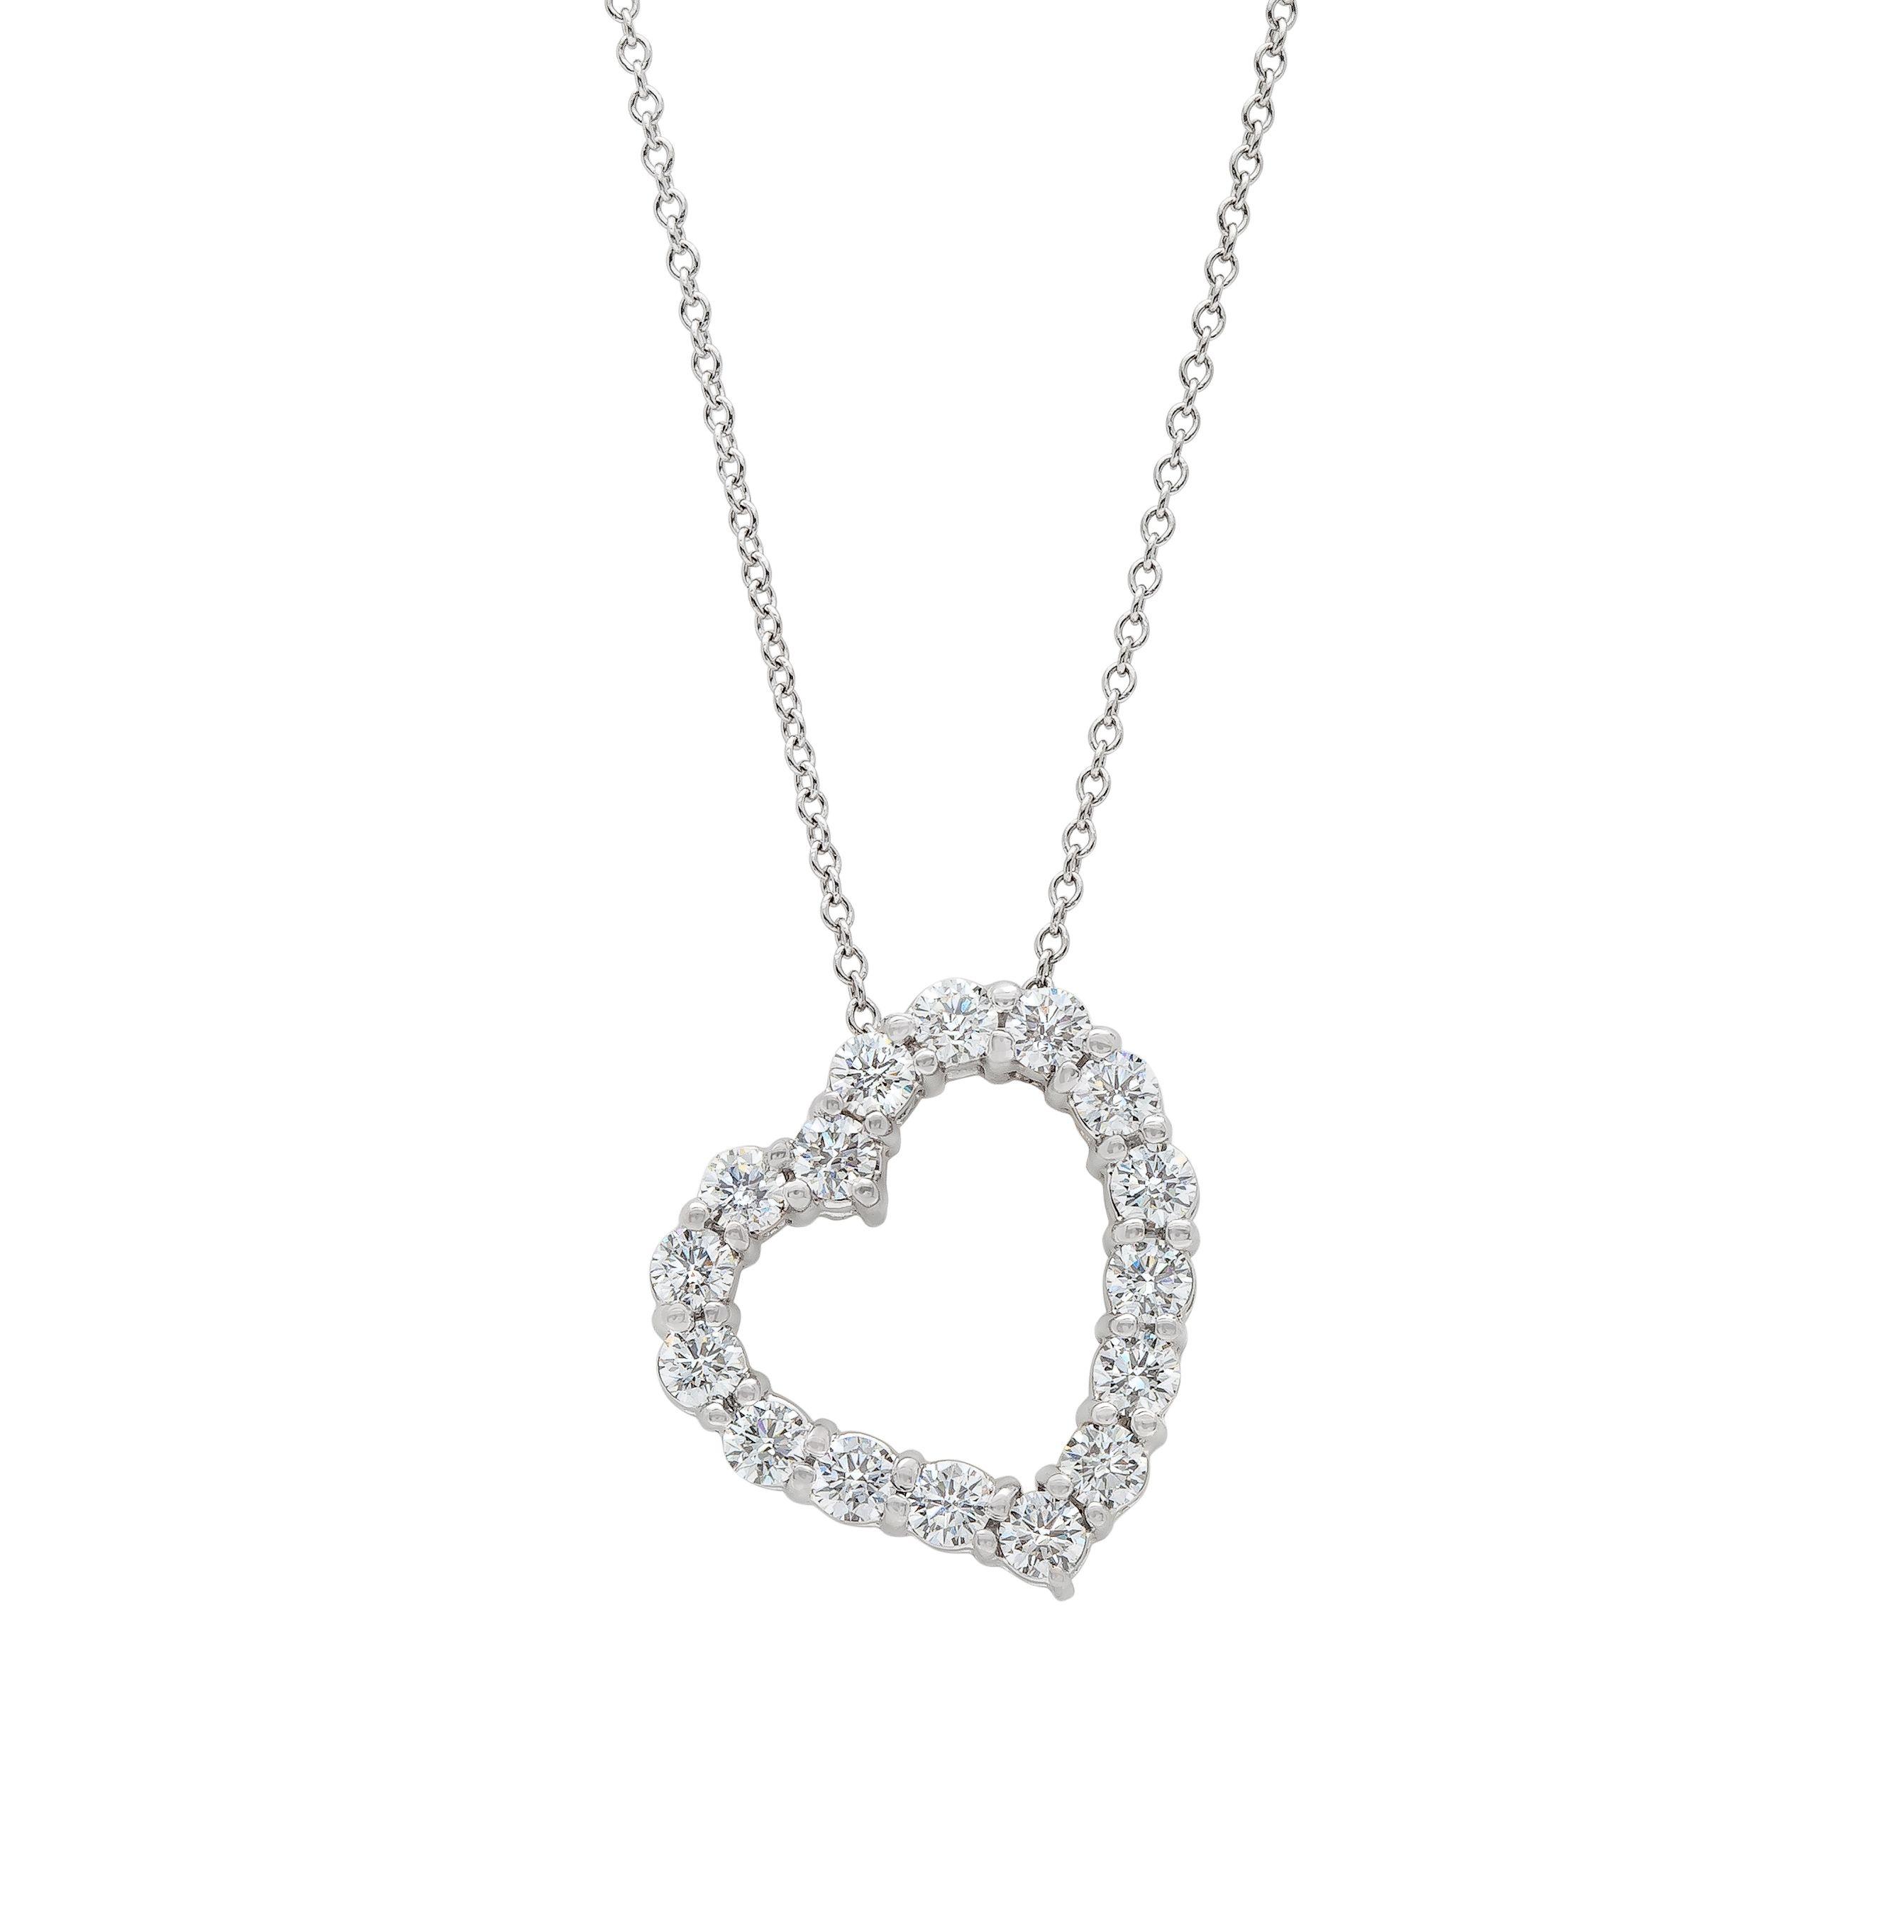 Gordon James Tilted Heart shaped Diamond Pendant 1 04 carat total